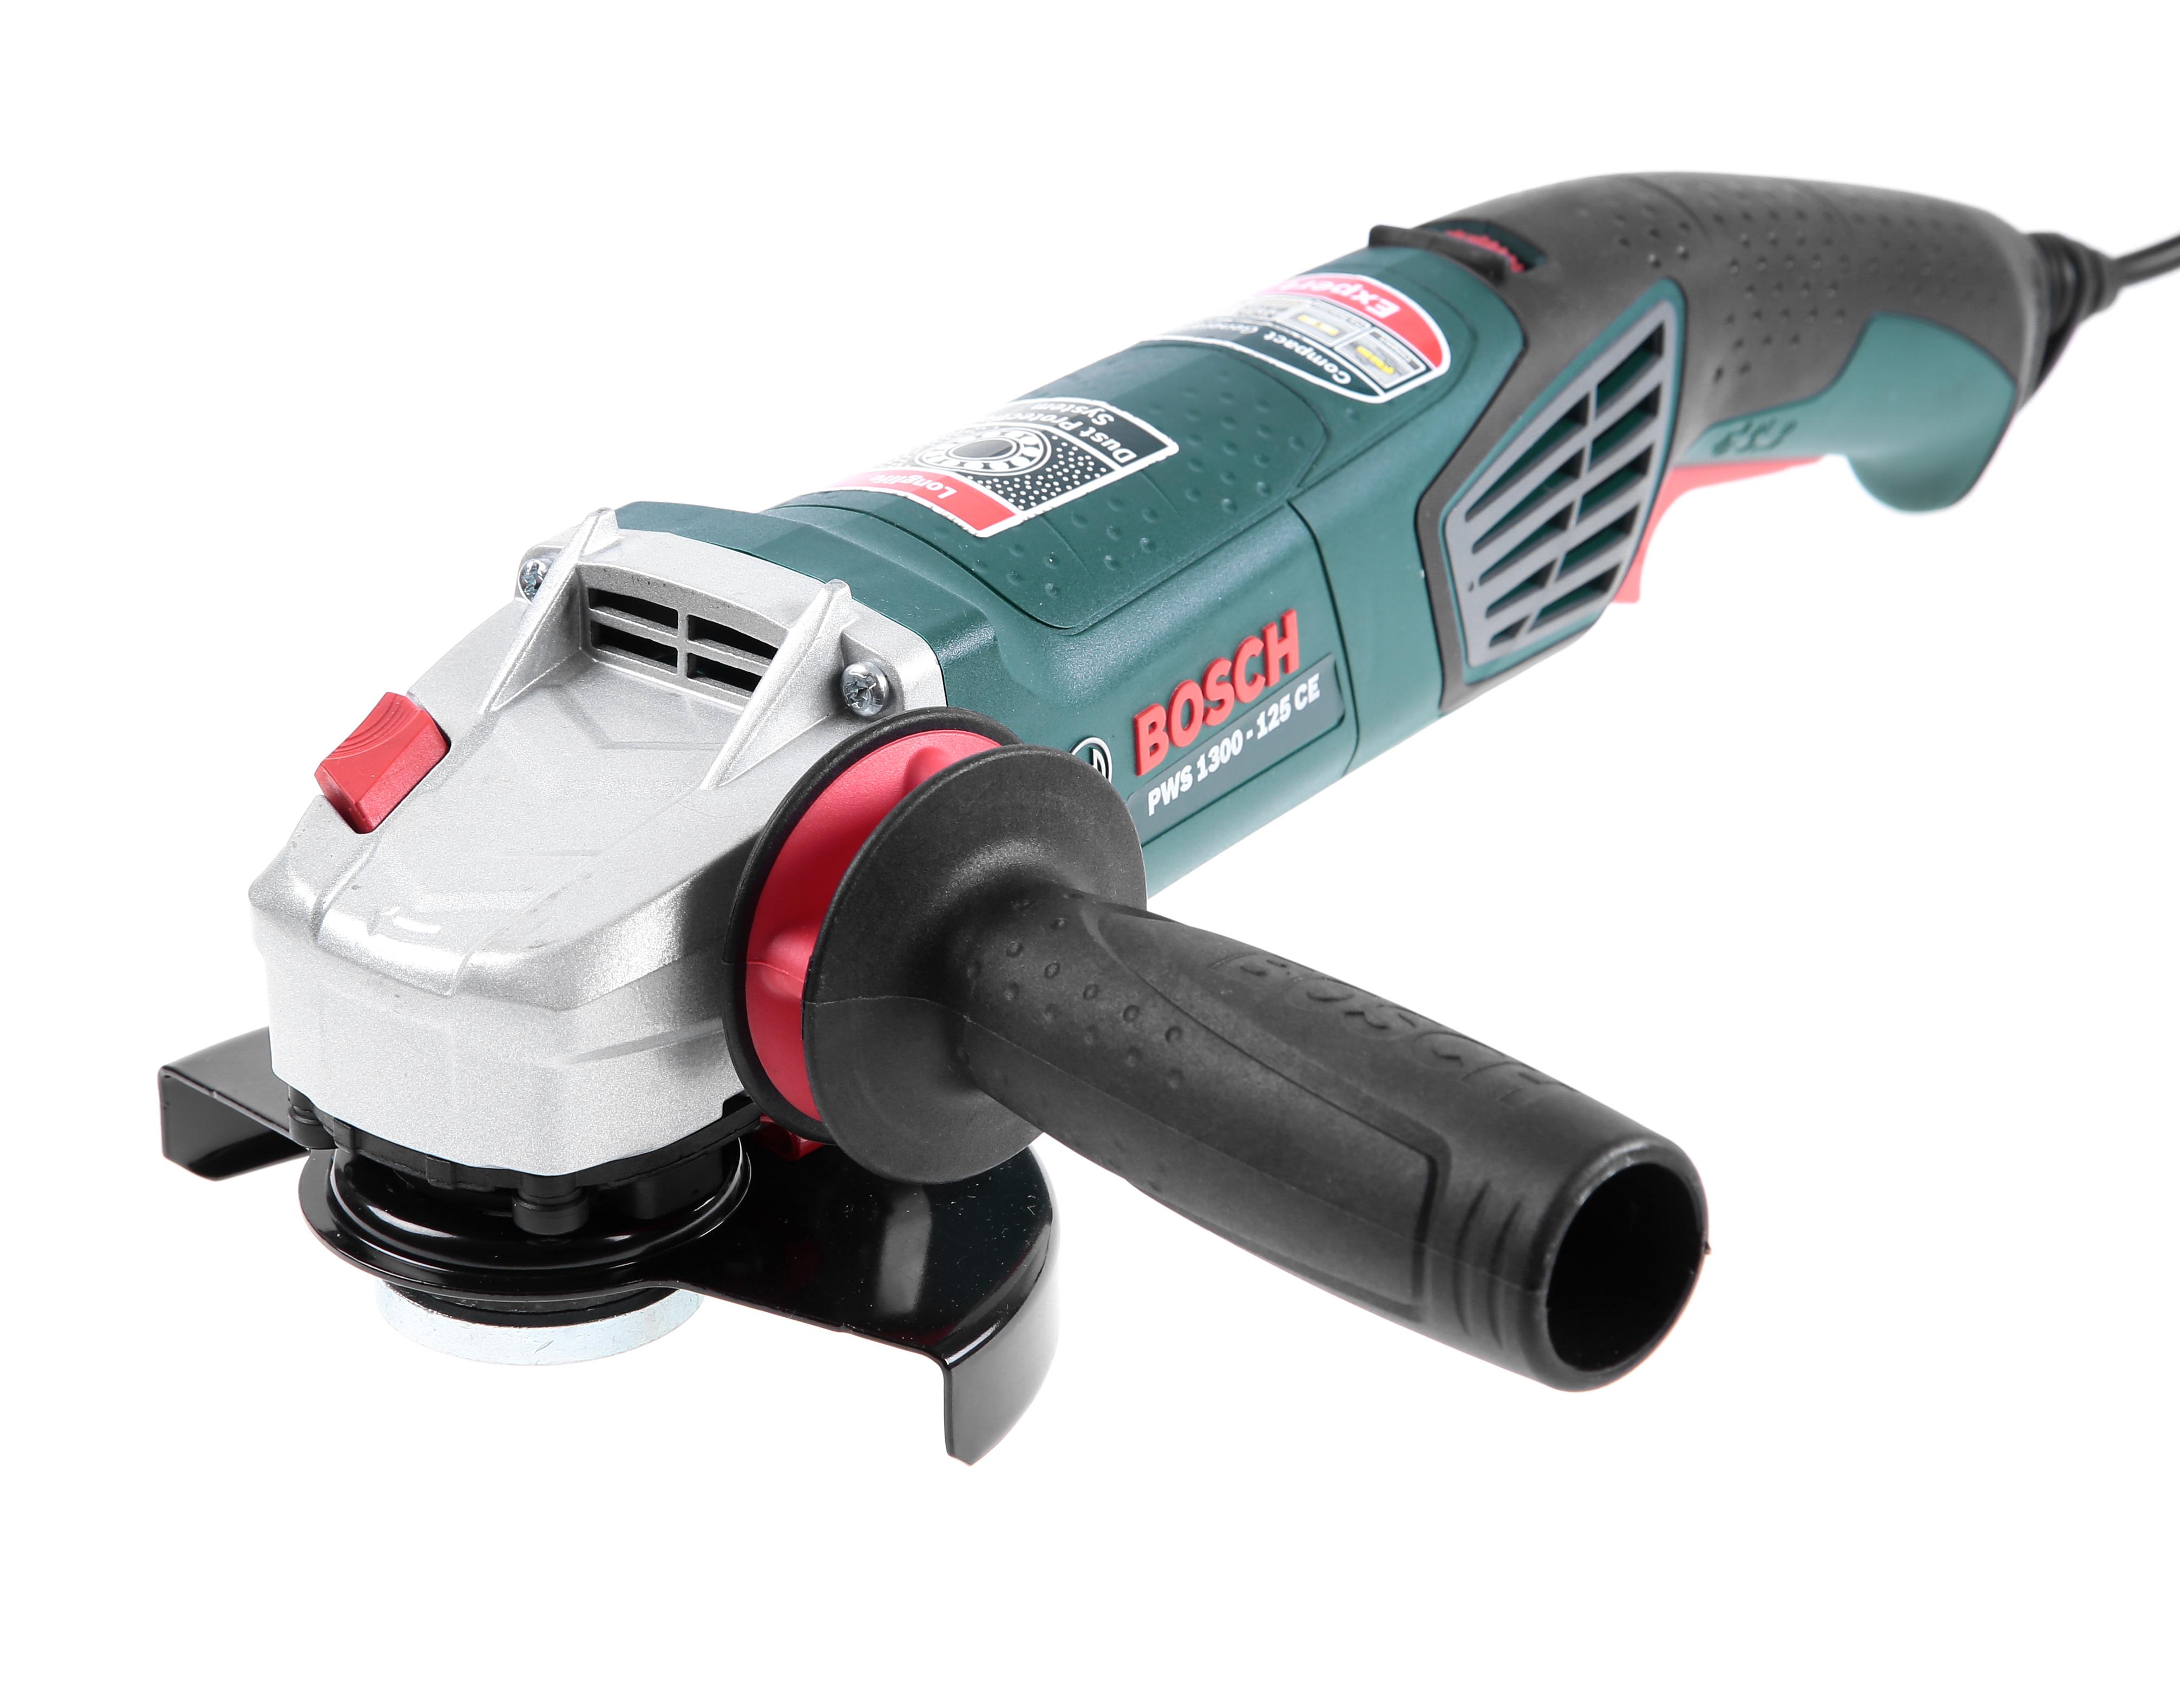 все цены на  УШМ (болгарка) Bosch Pws 1300-125 ce (0.603.3a2.920)  онлайн